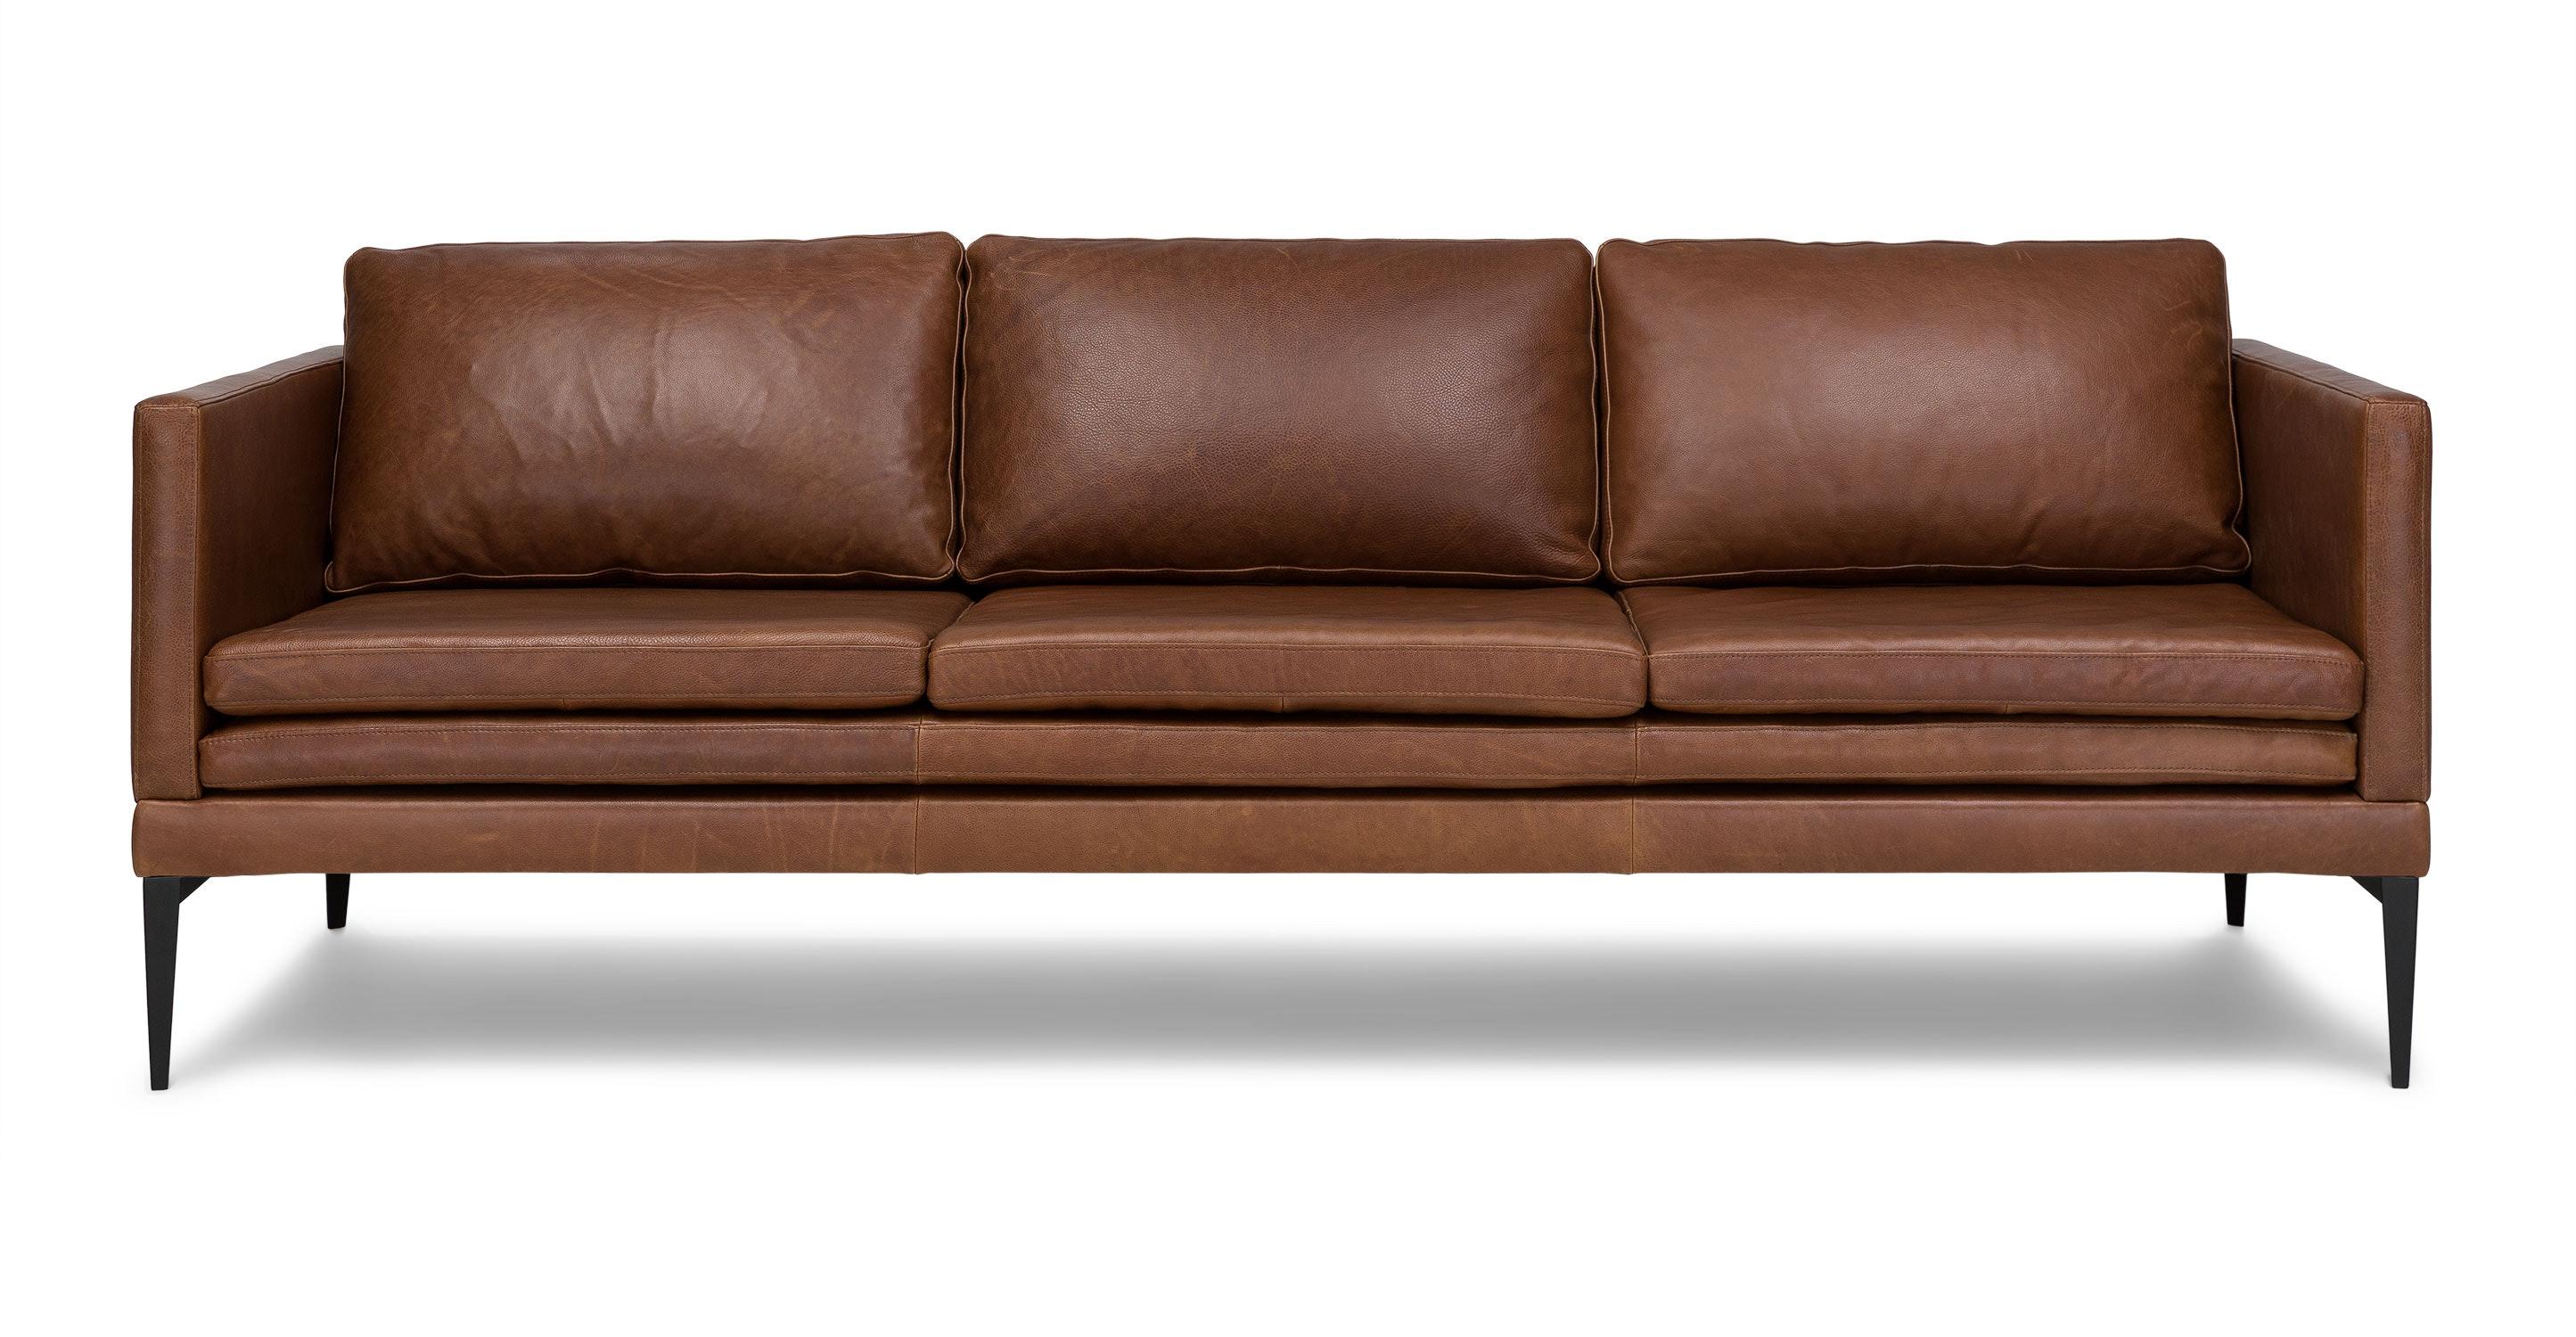 Triplo Taos Brown Sofa Sofas Article